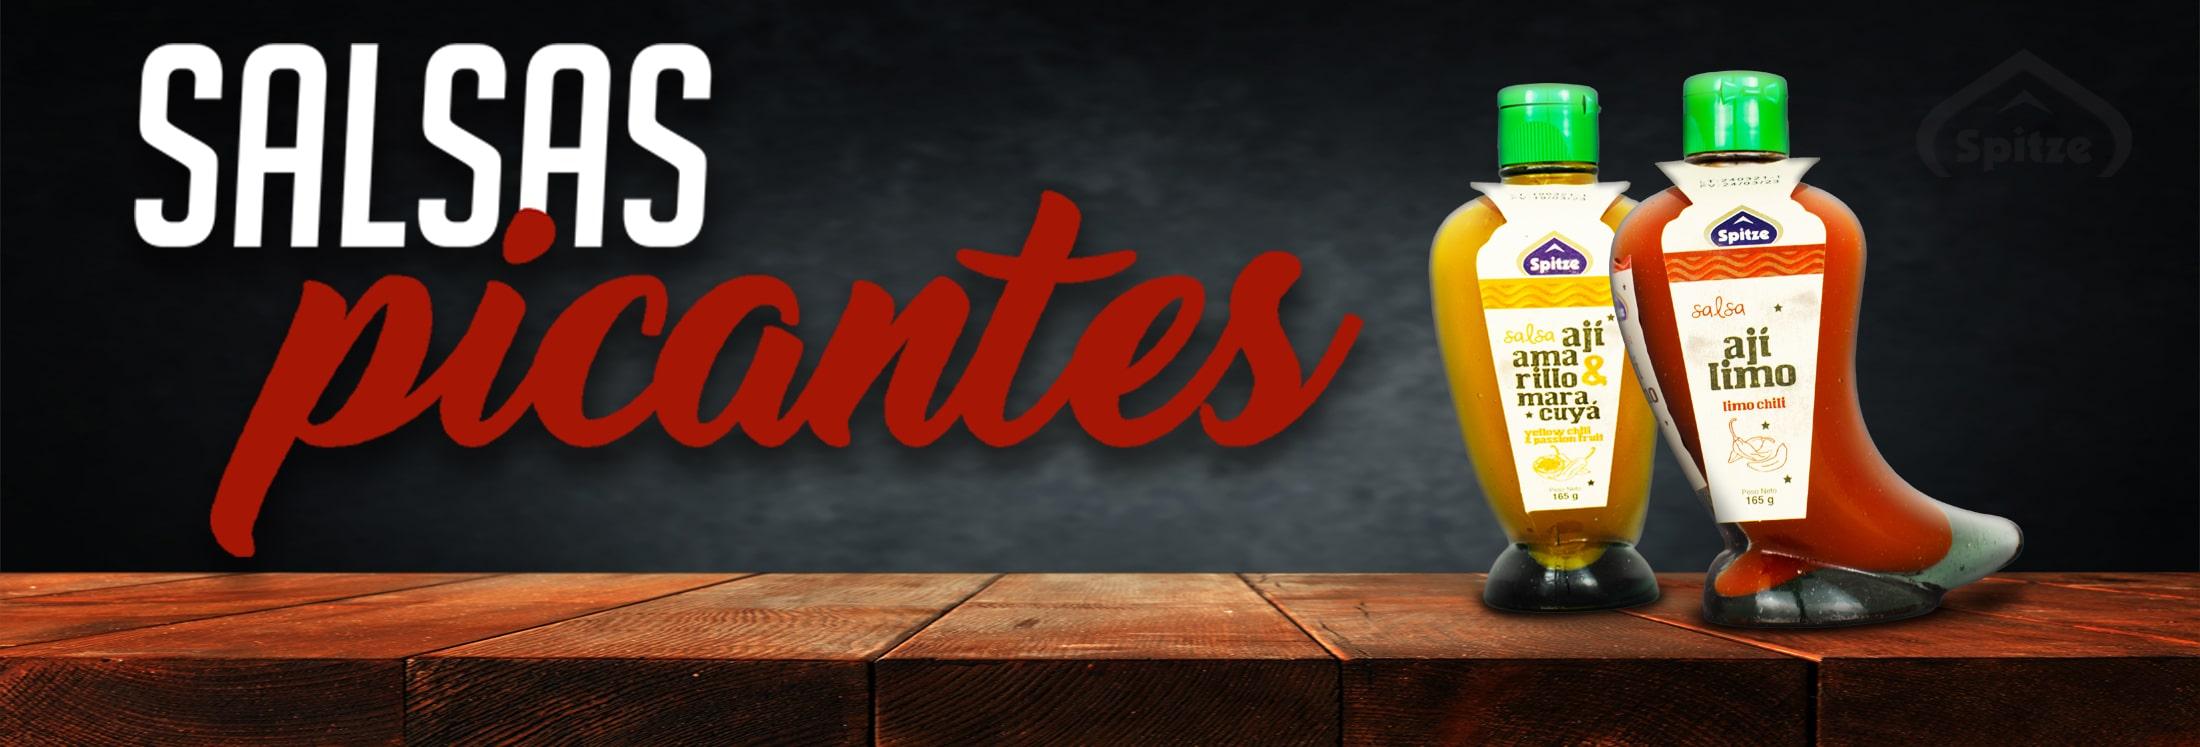 Banner Salsas Picantes